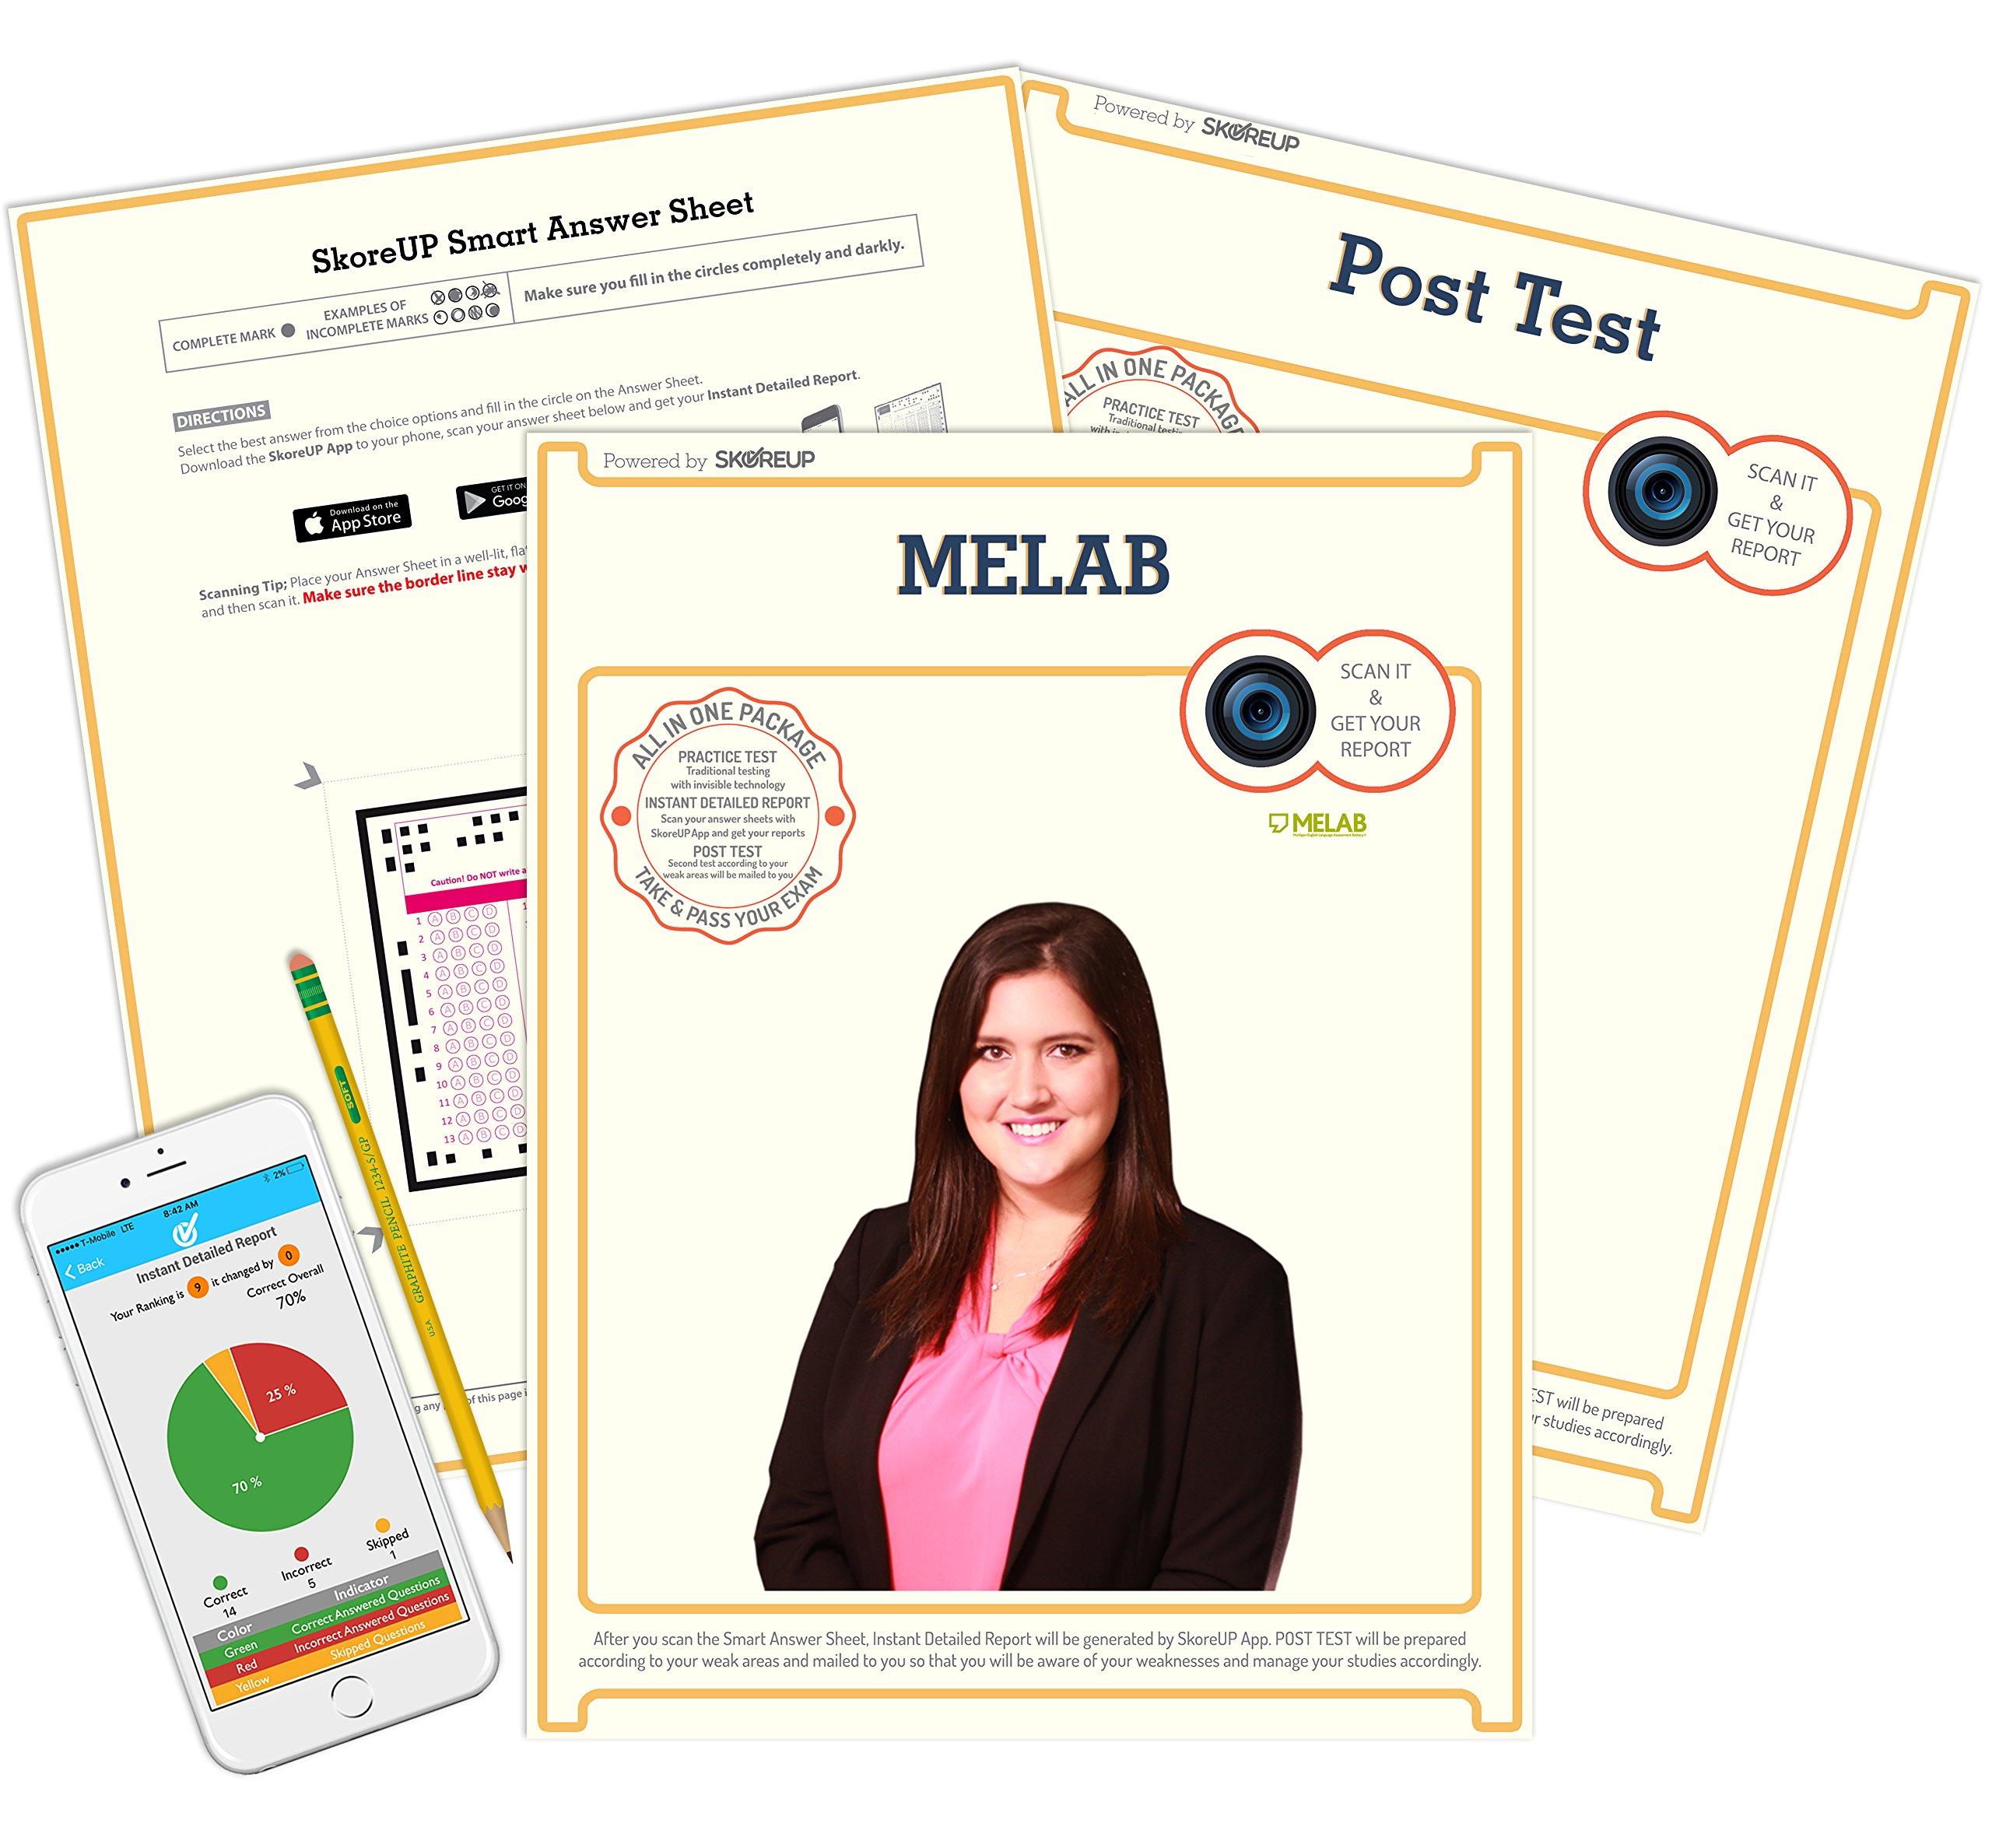 The Michigan English Language Assessment Battery Exam Melab Test Prep Study Guide Skoreup Llc 0769079170464 Amazon Com Books What is mercer mettl assessment battery? the michigan english language